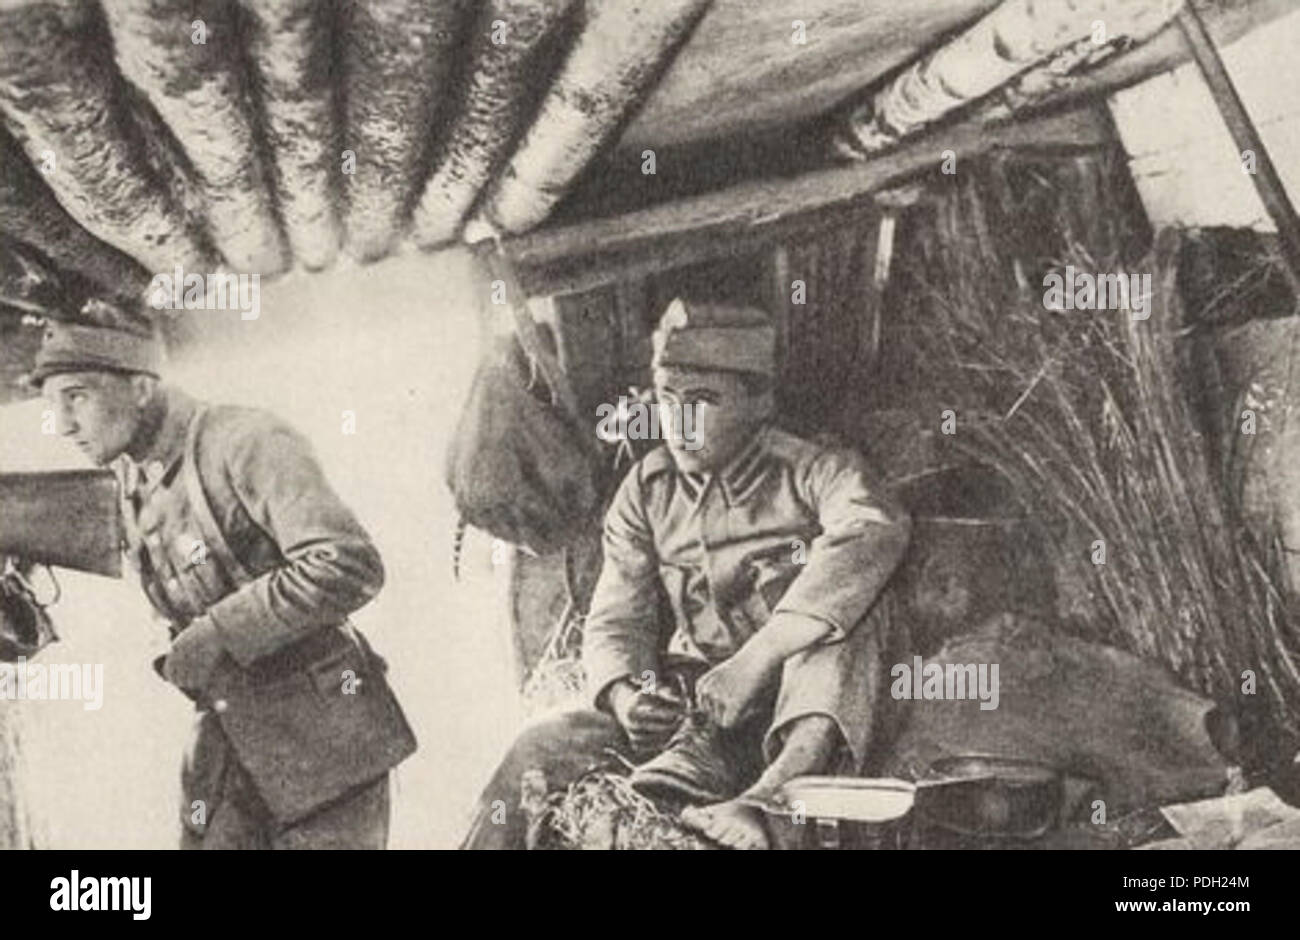 246 Okopy pod Konarami 02, 1915